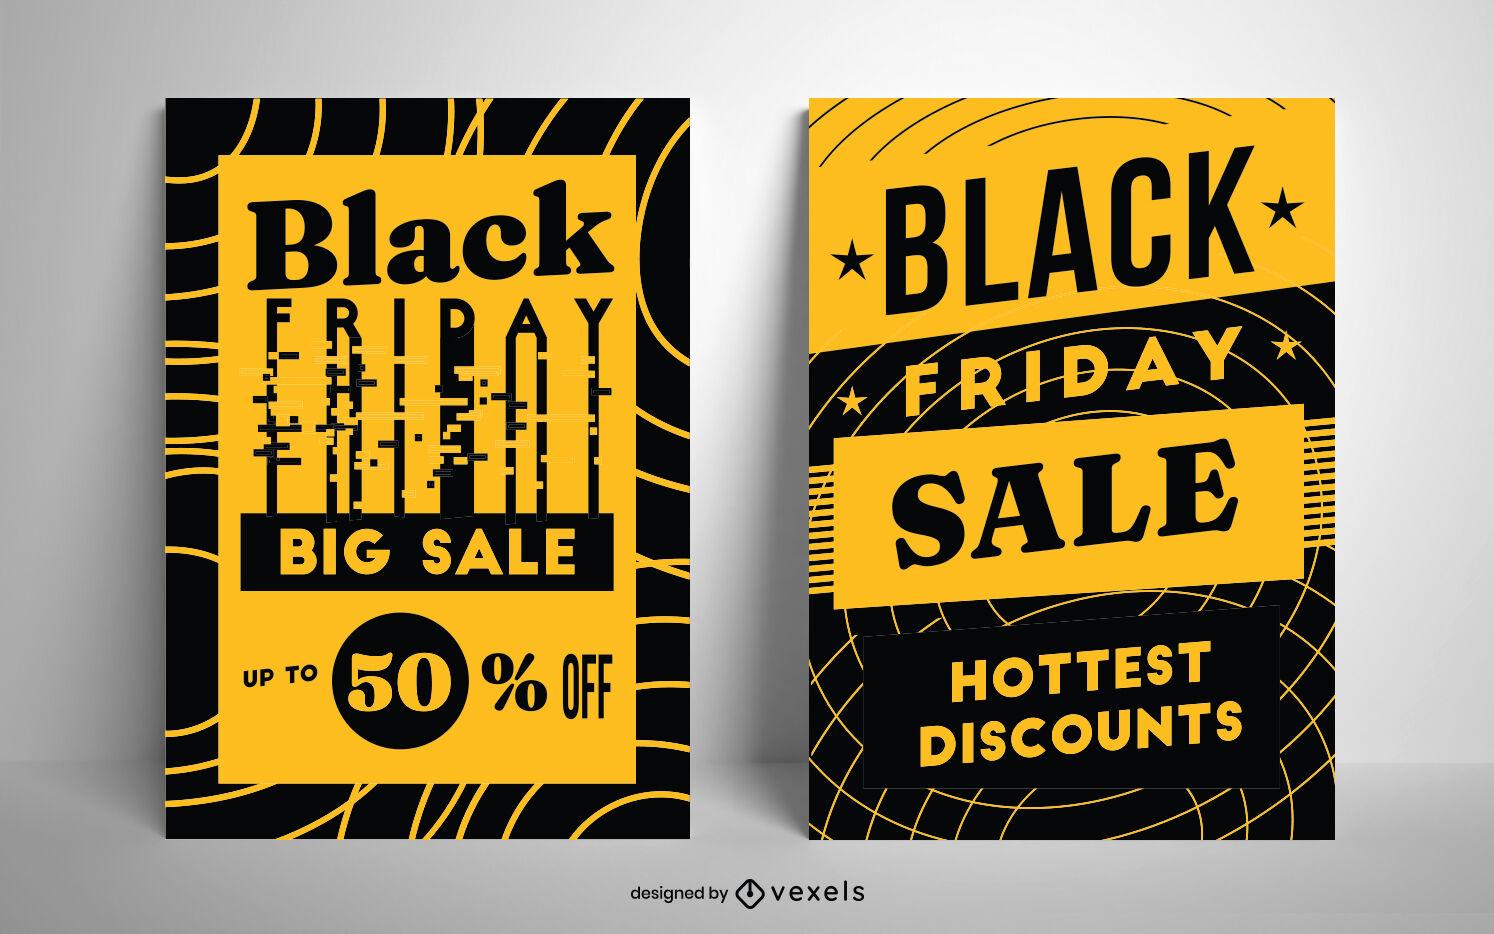 Black Friday-Duoton-Poster-Design-Set